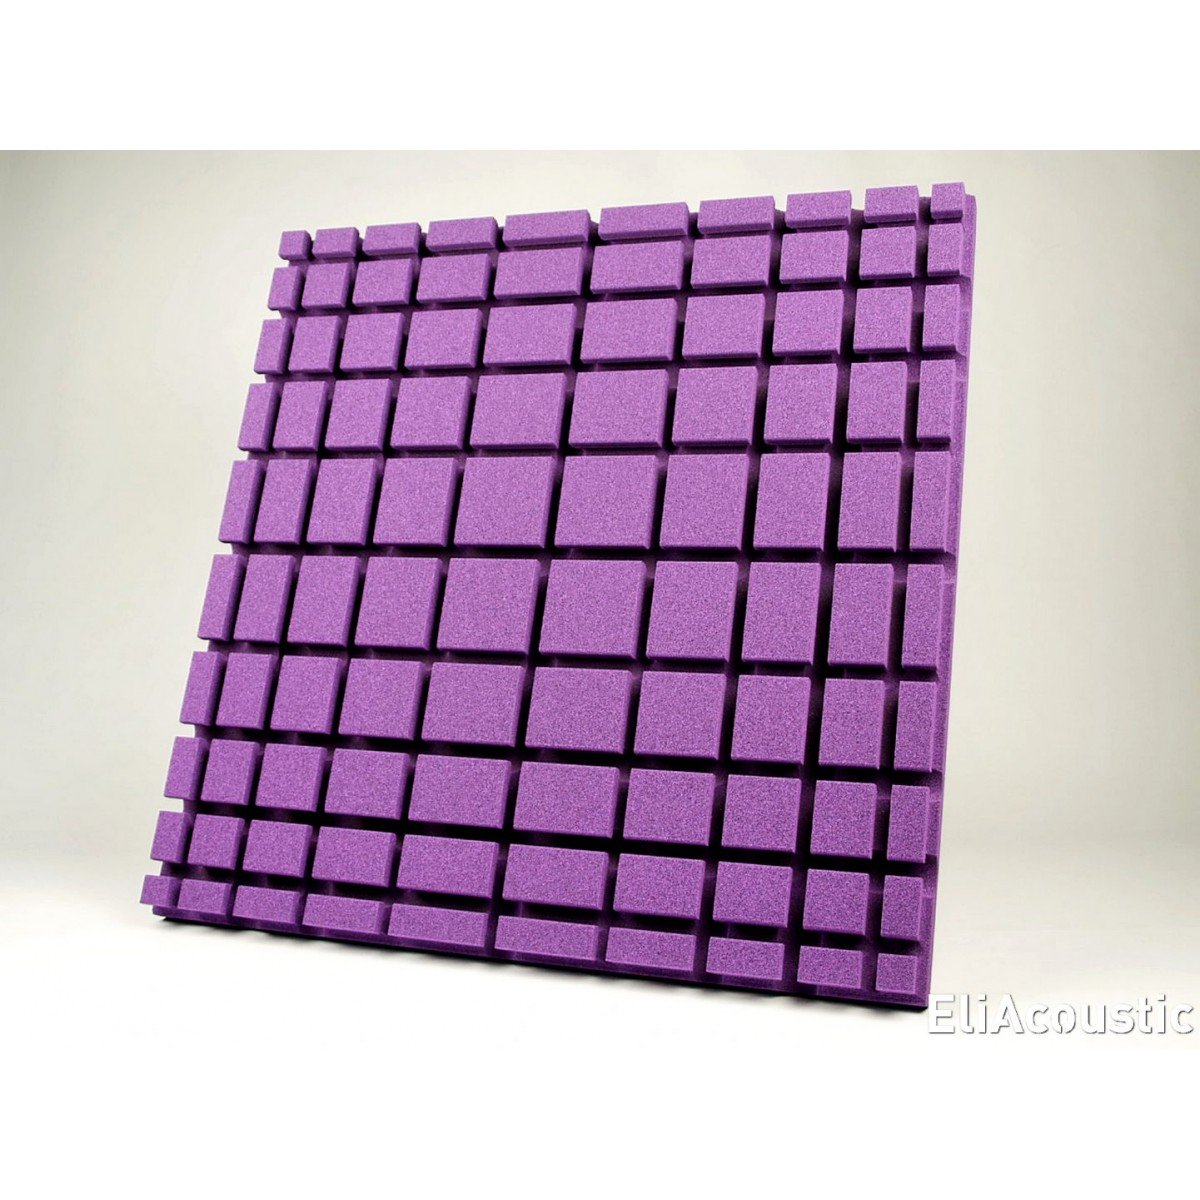 EliAcoustic Radar Pure Purple